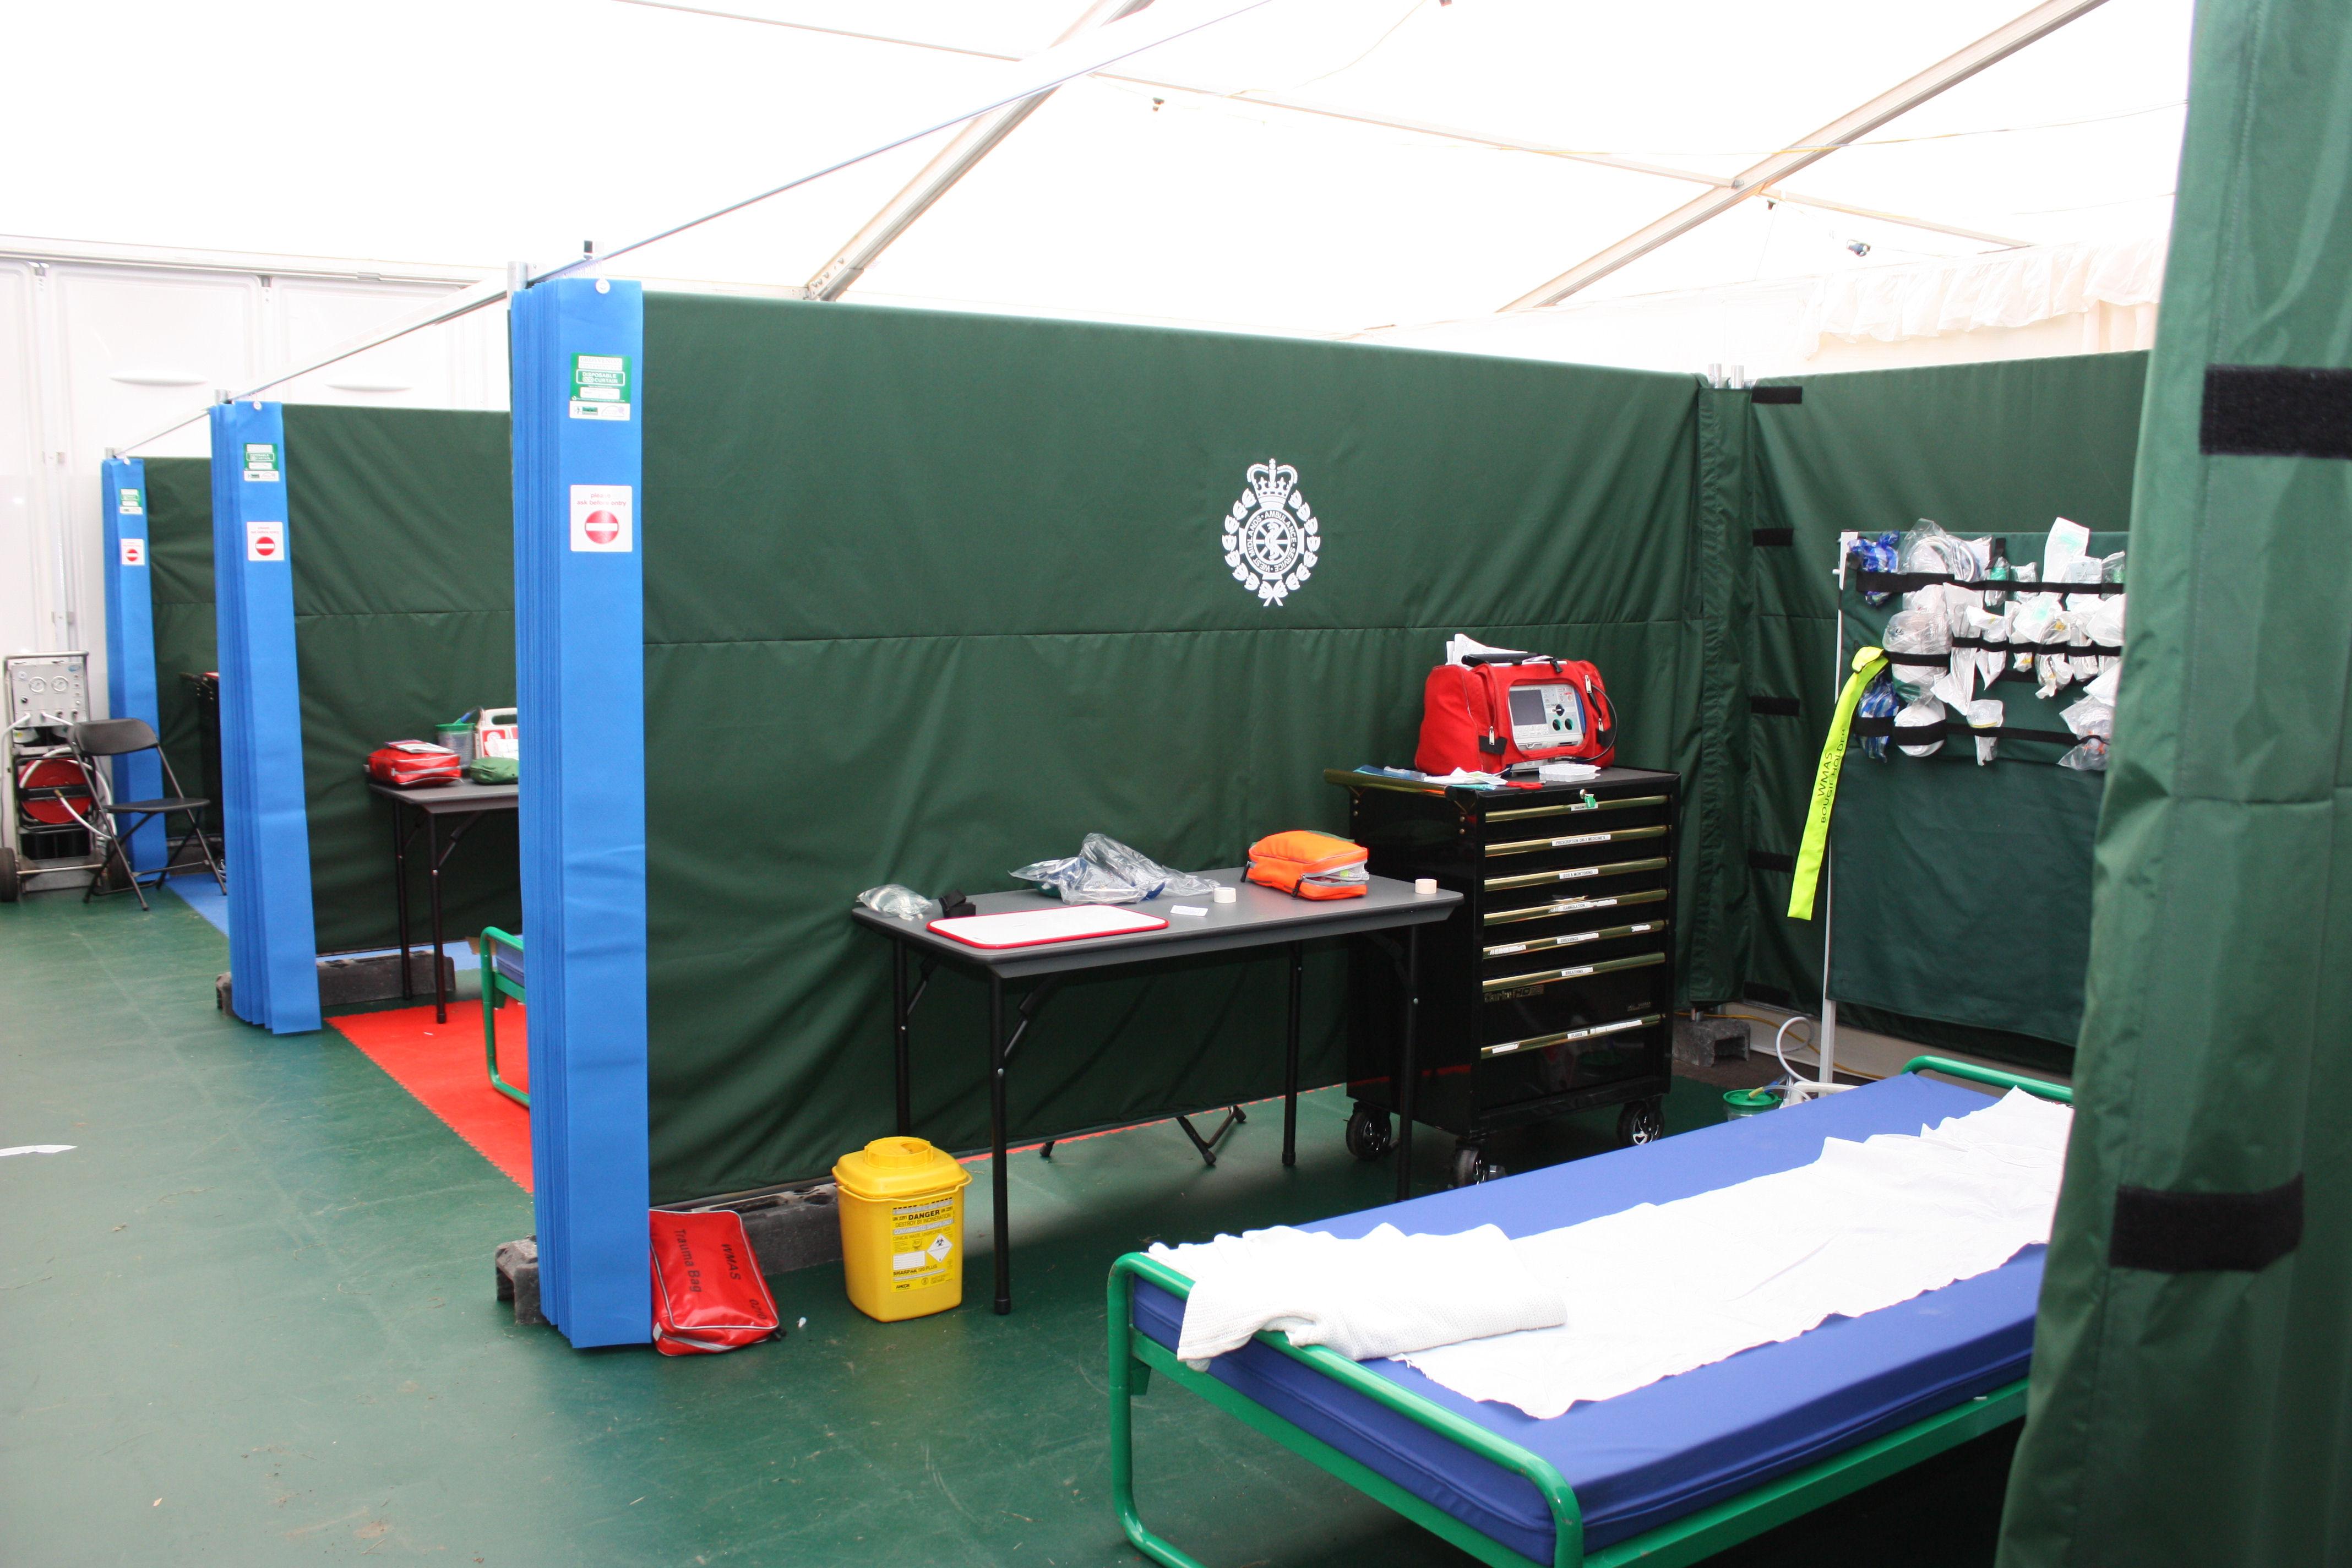 Medical Tent & Music tent or medical tentu2026u2026take your pick! u2013 West Midlands ...